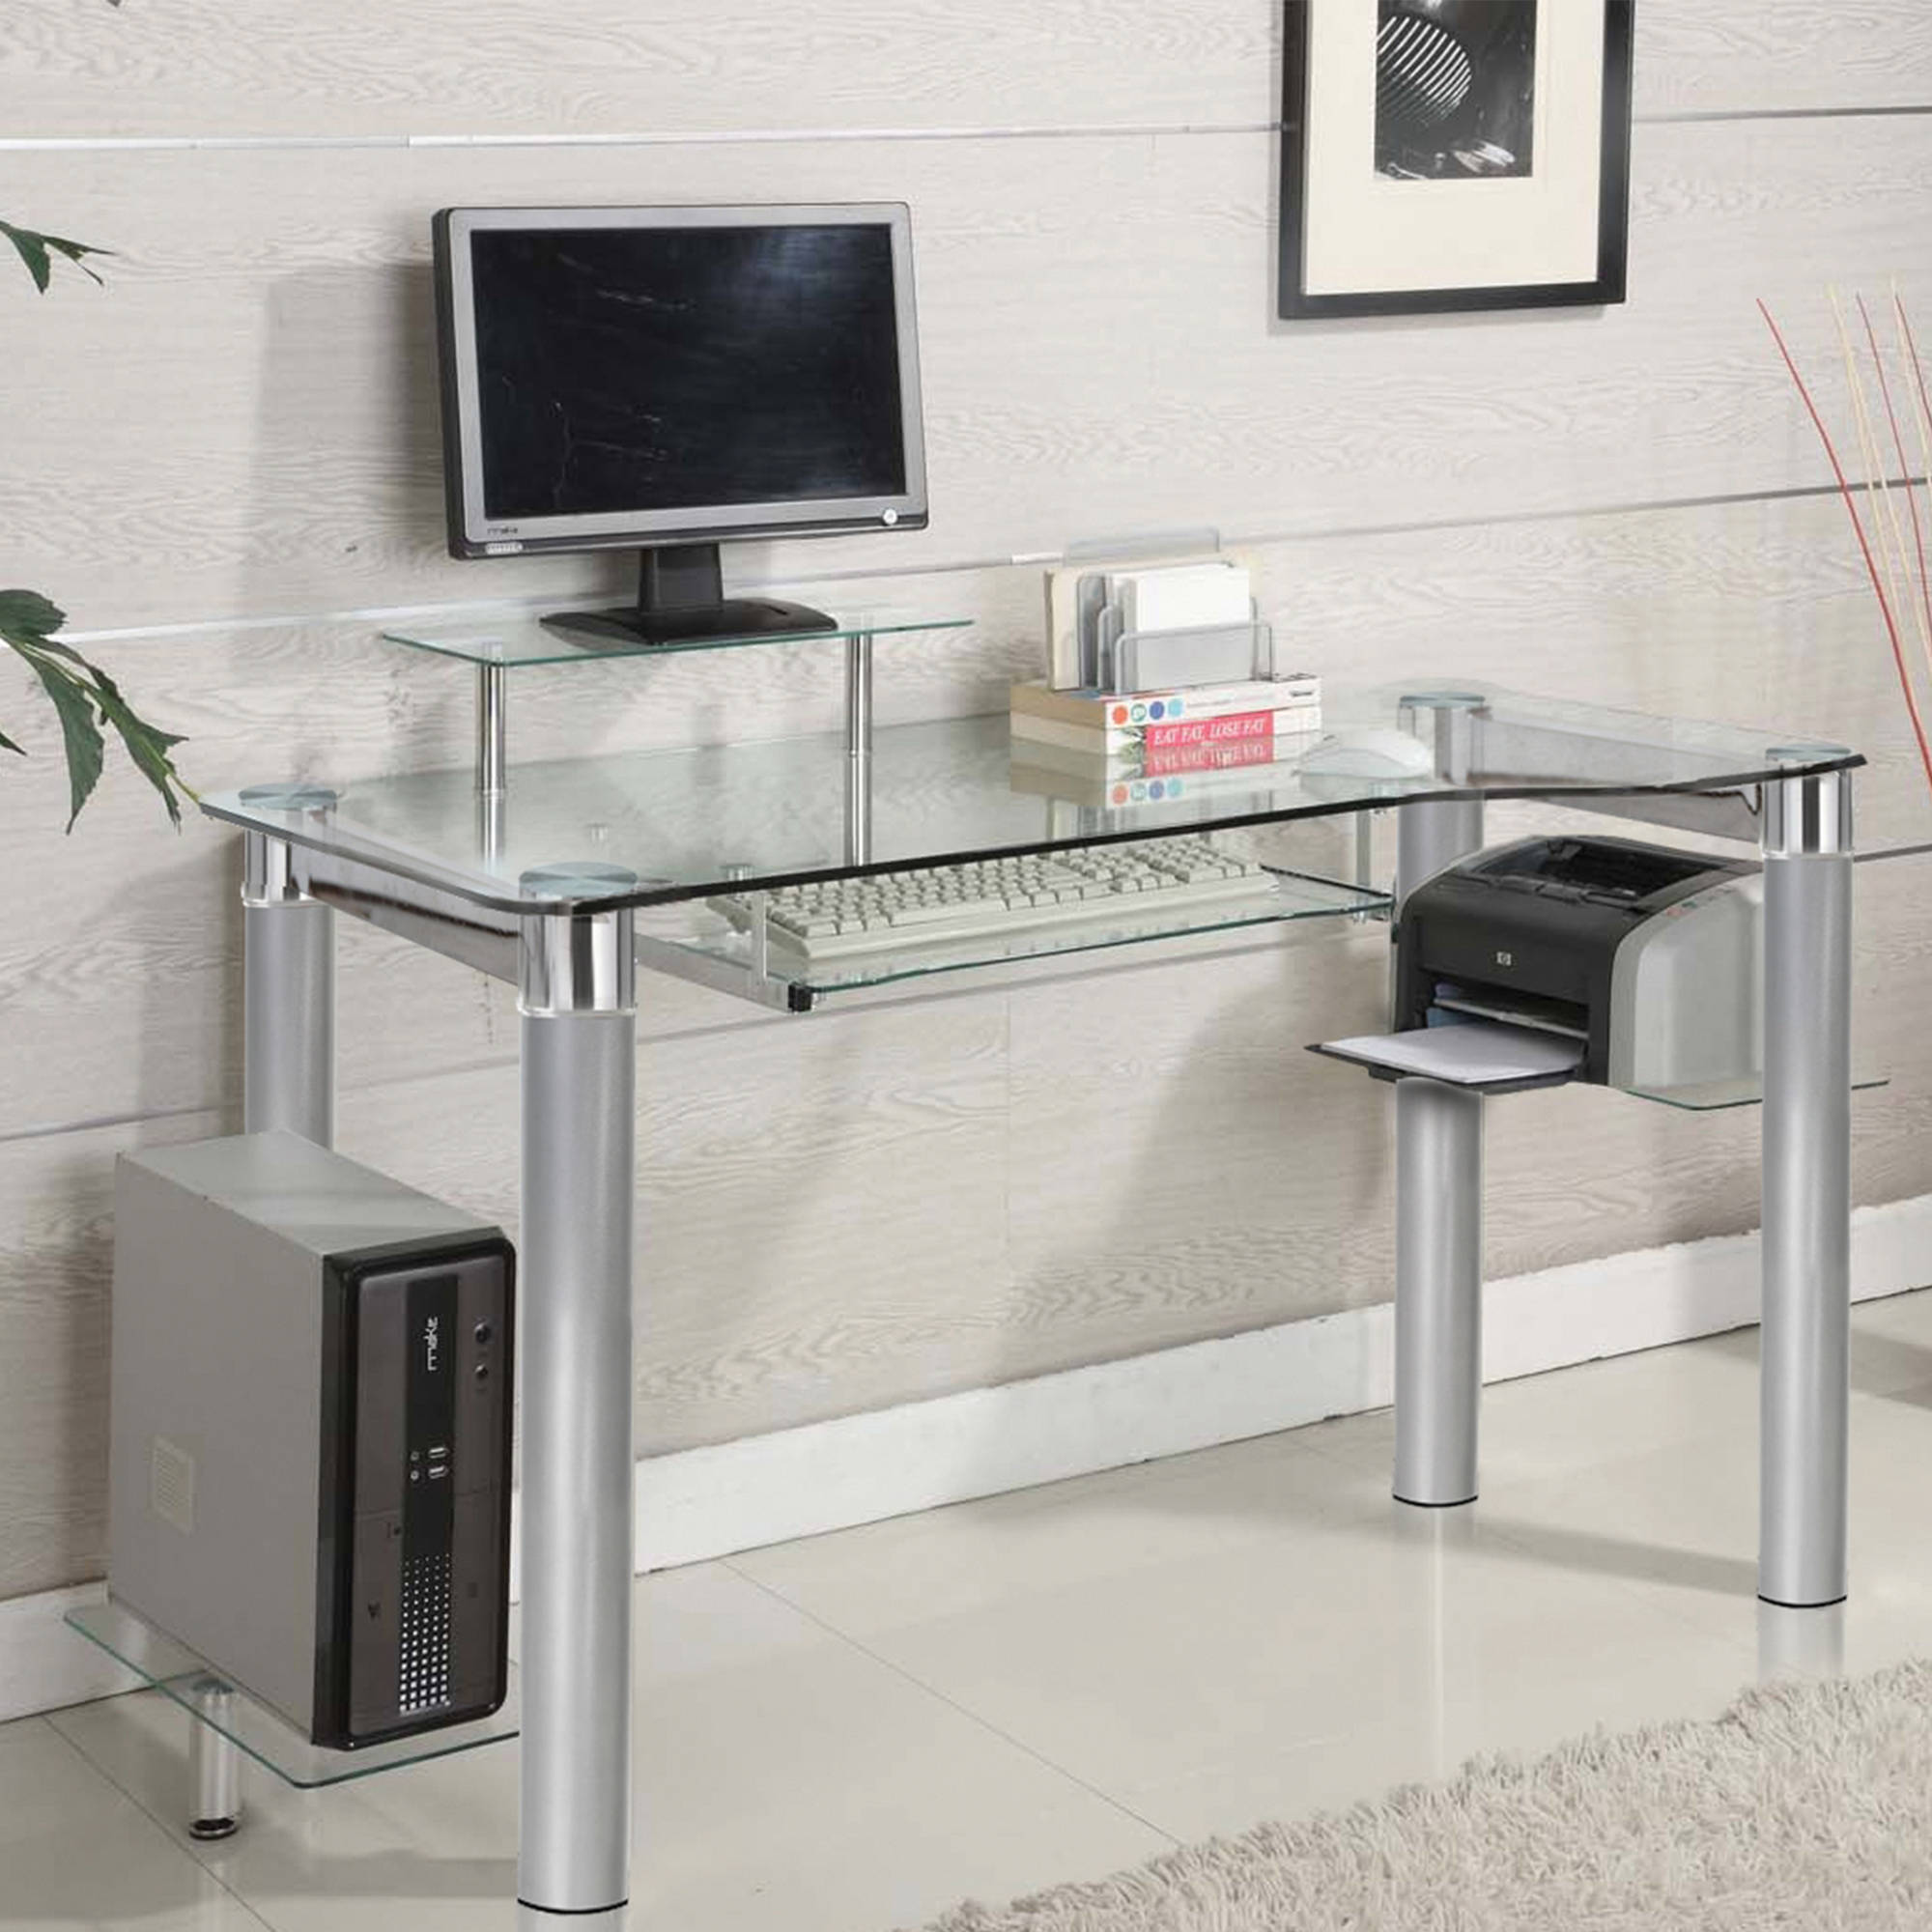 Glass computer desk innovex clear tempered glass modern style saturn desk - walmart.com OYXGQSW